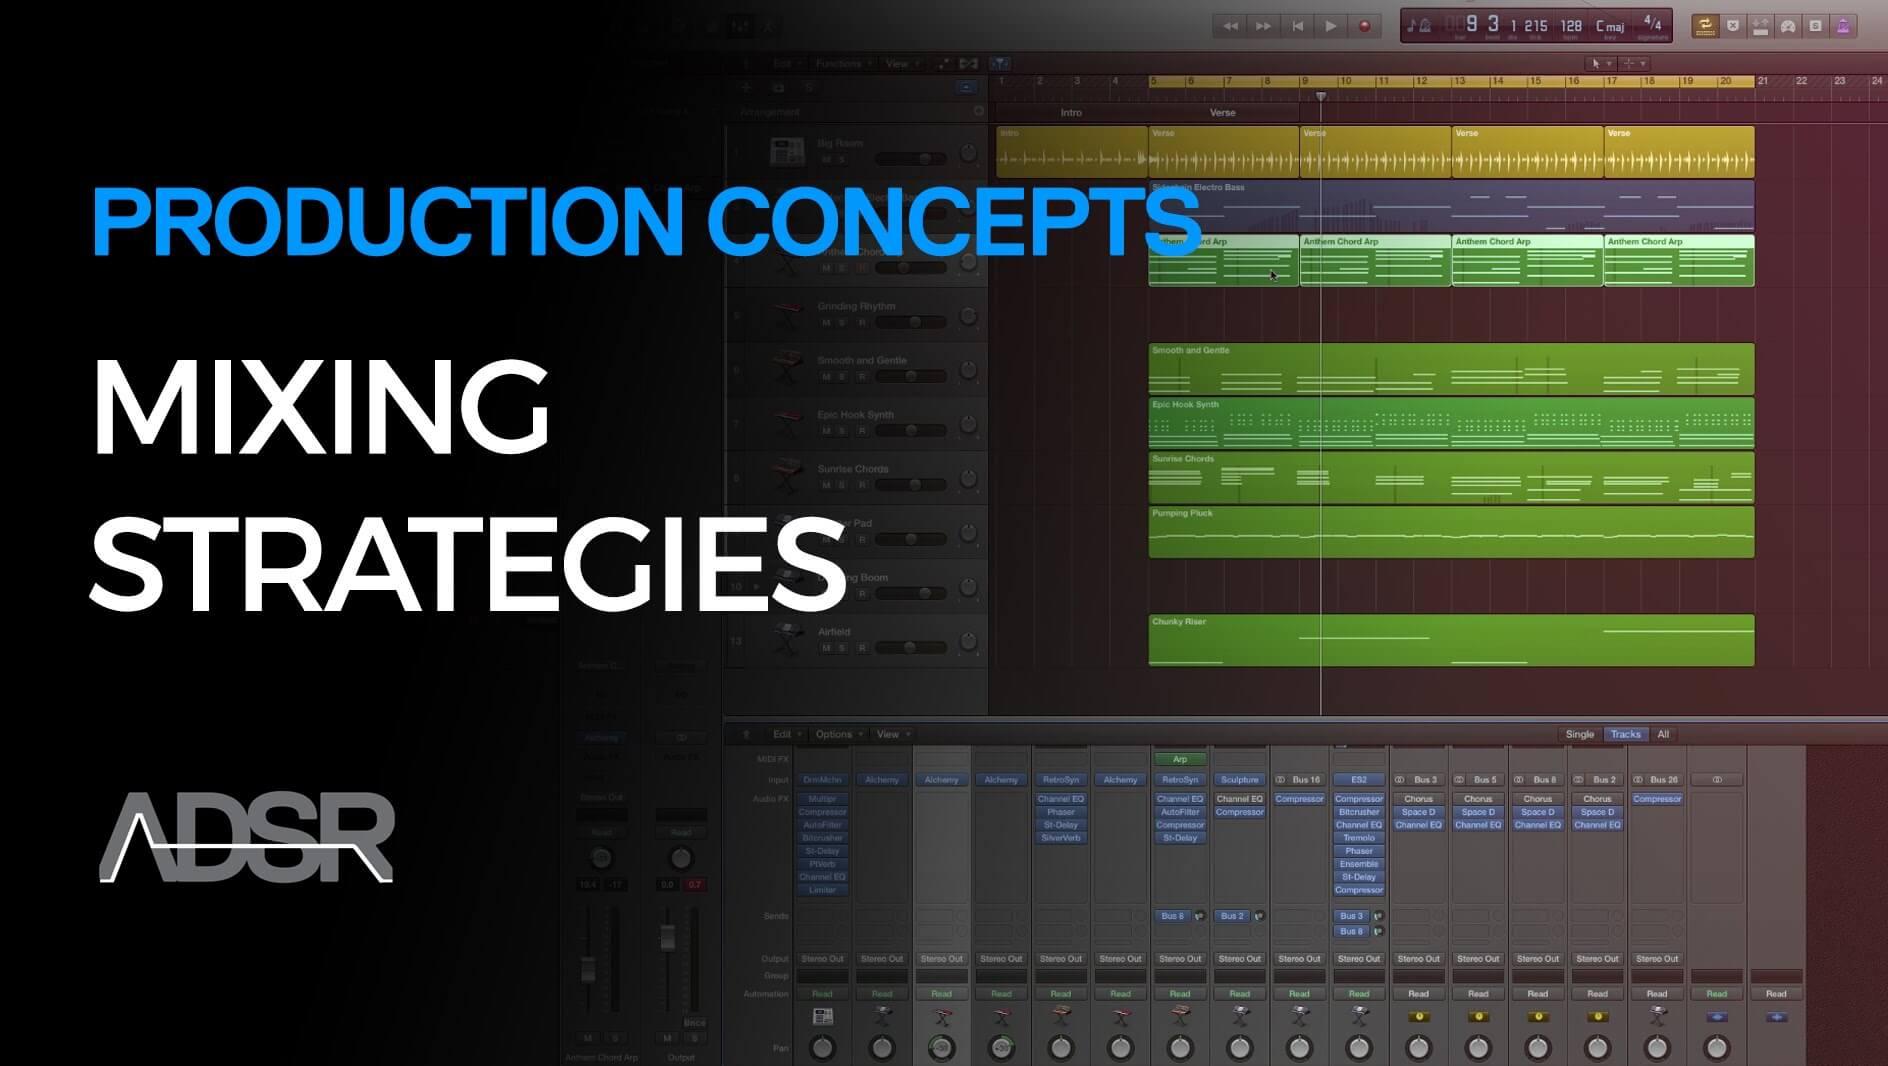 Mixing Strategies